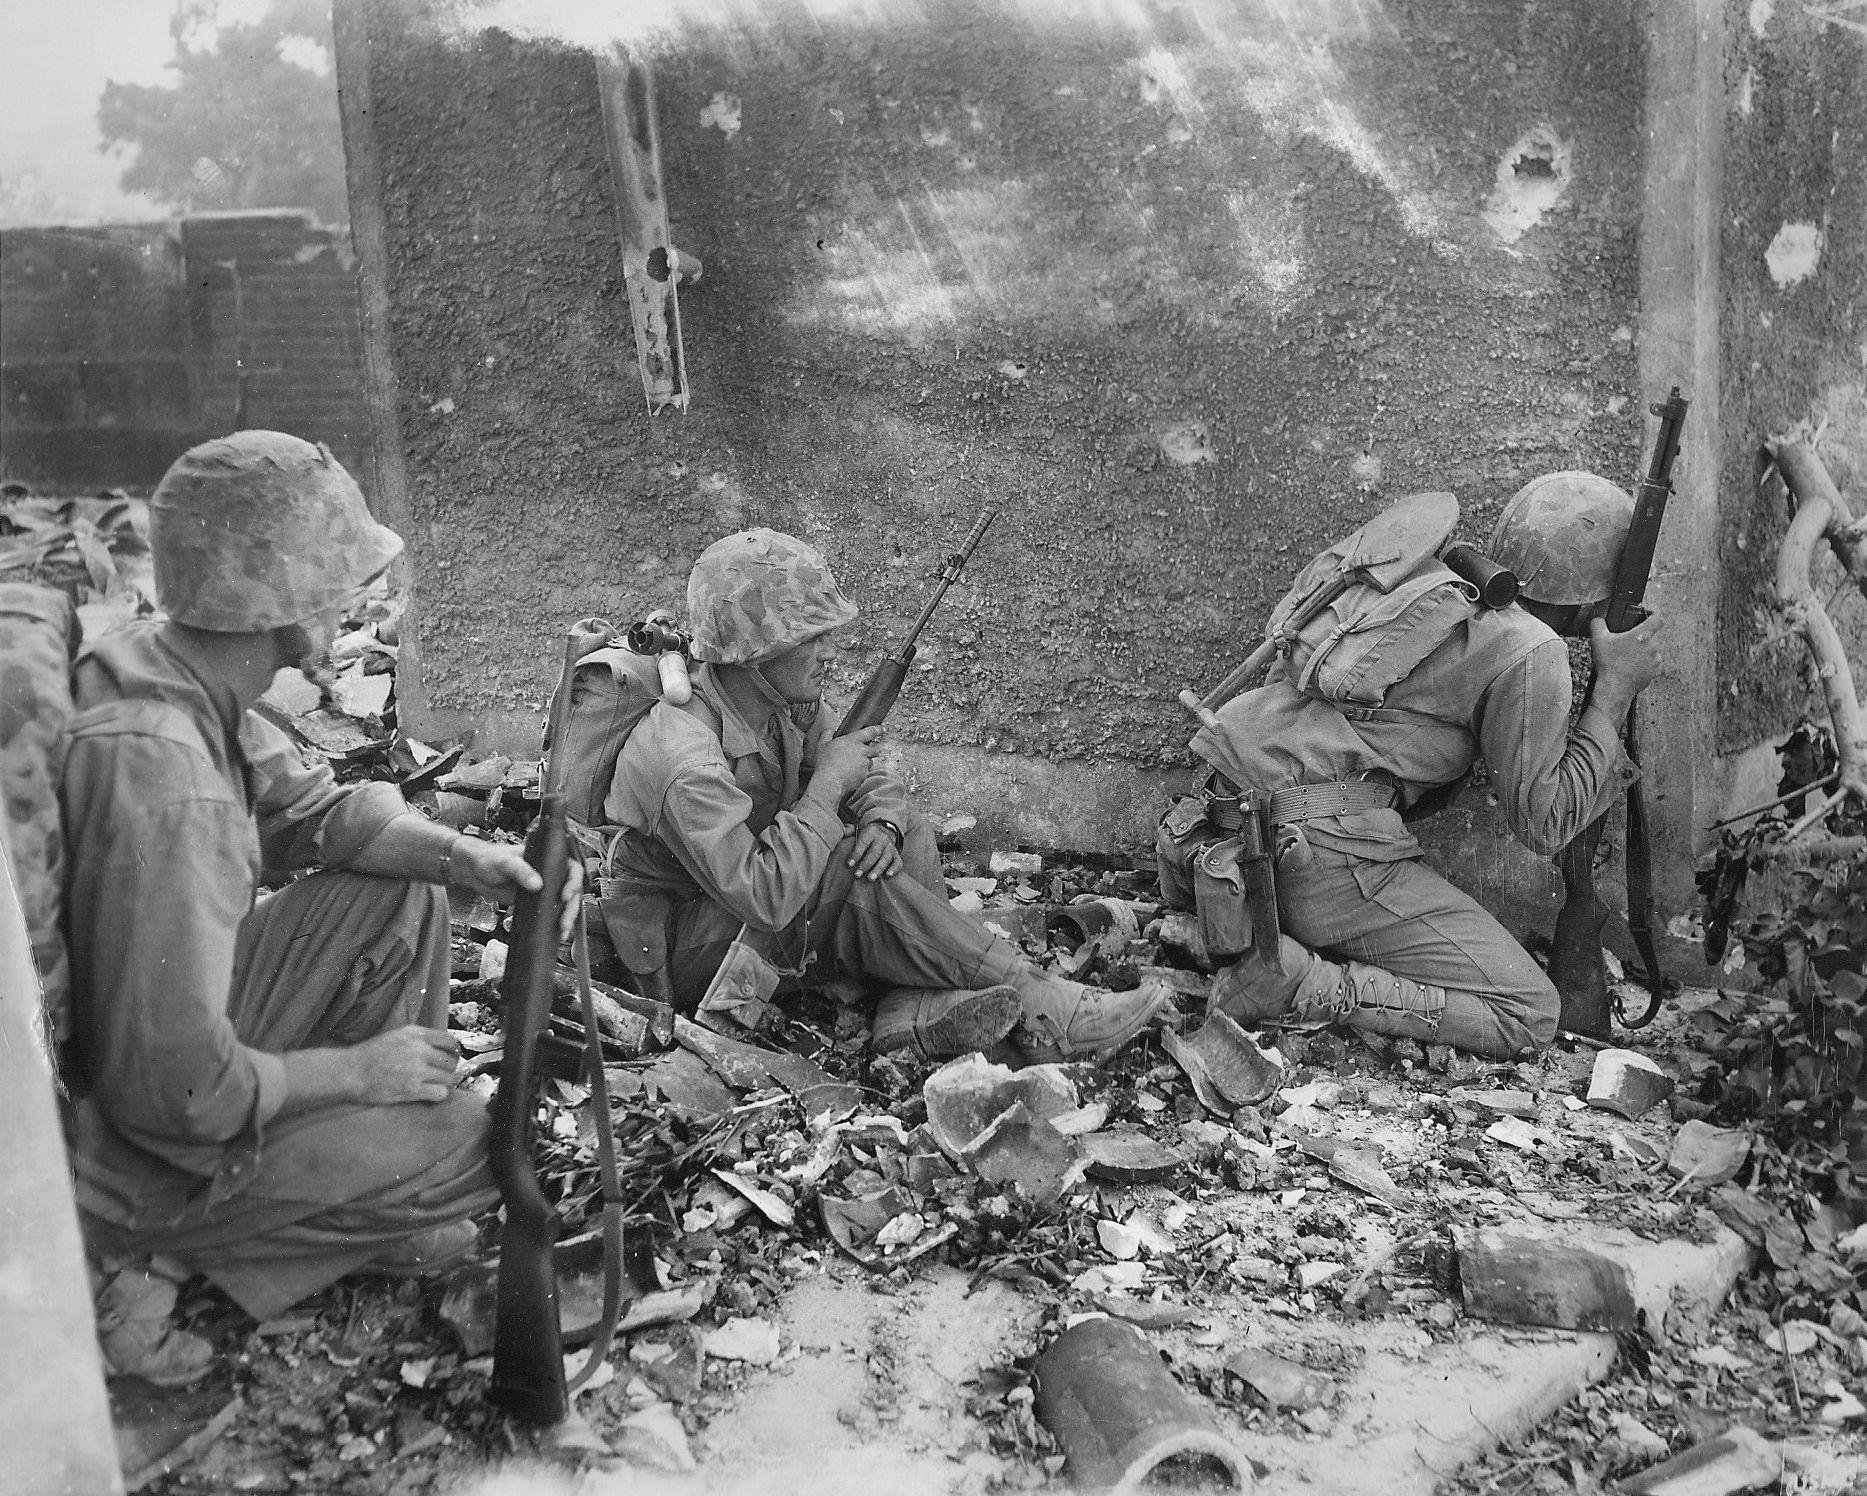 WWII photo American Marine in the ruined city of Naha in Okinawa war 9o